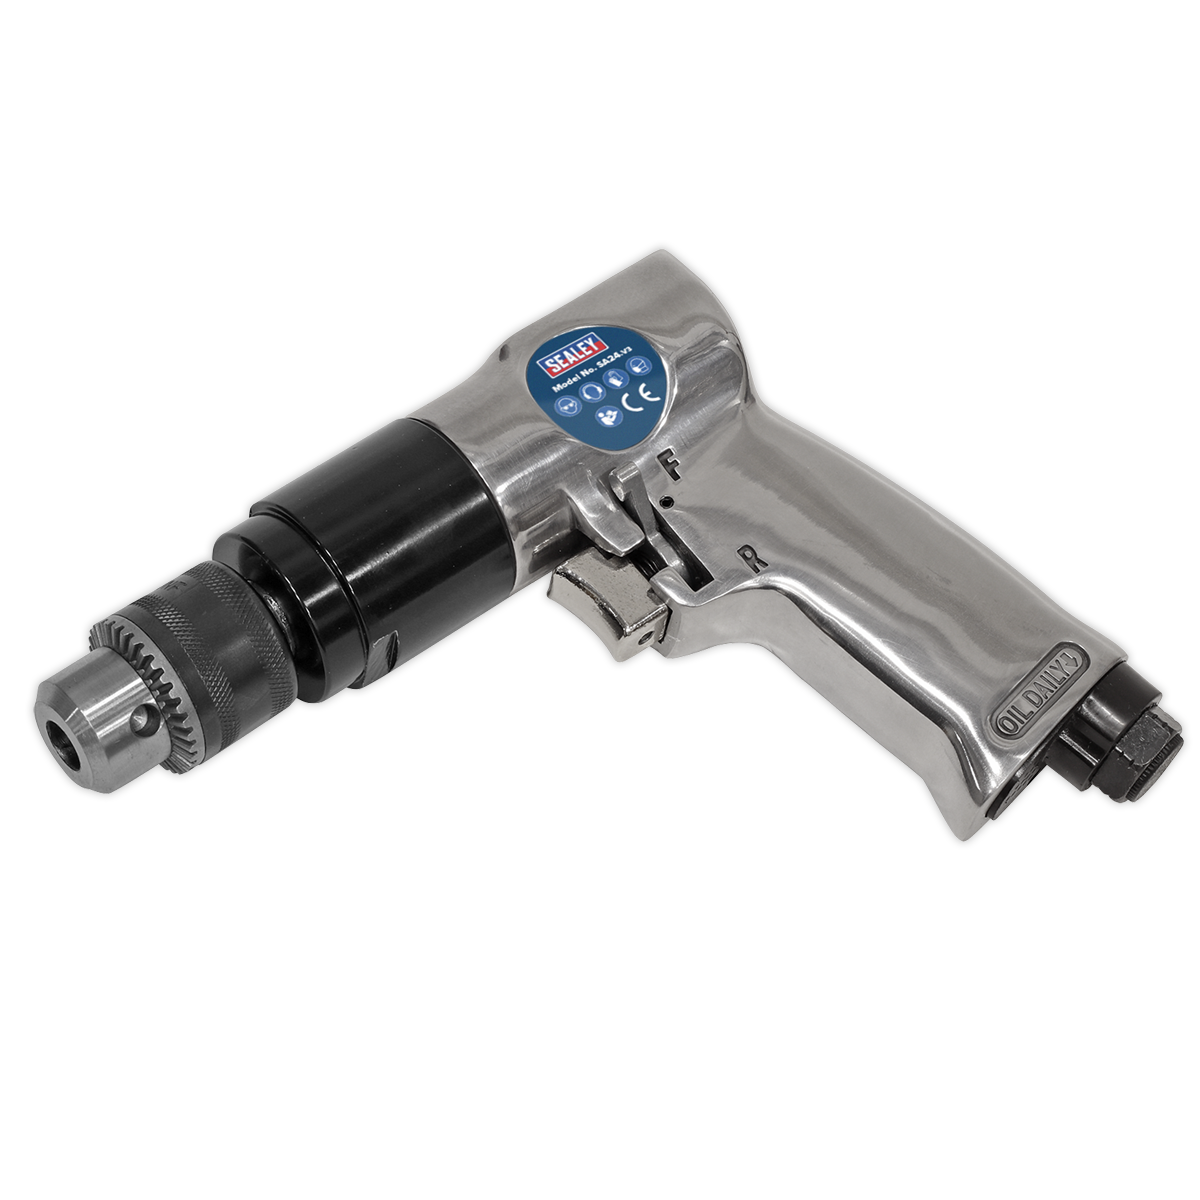 Air Drill Ø10mm 1800rpm Reversible